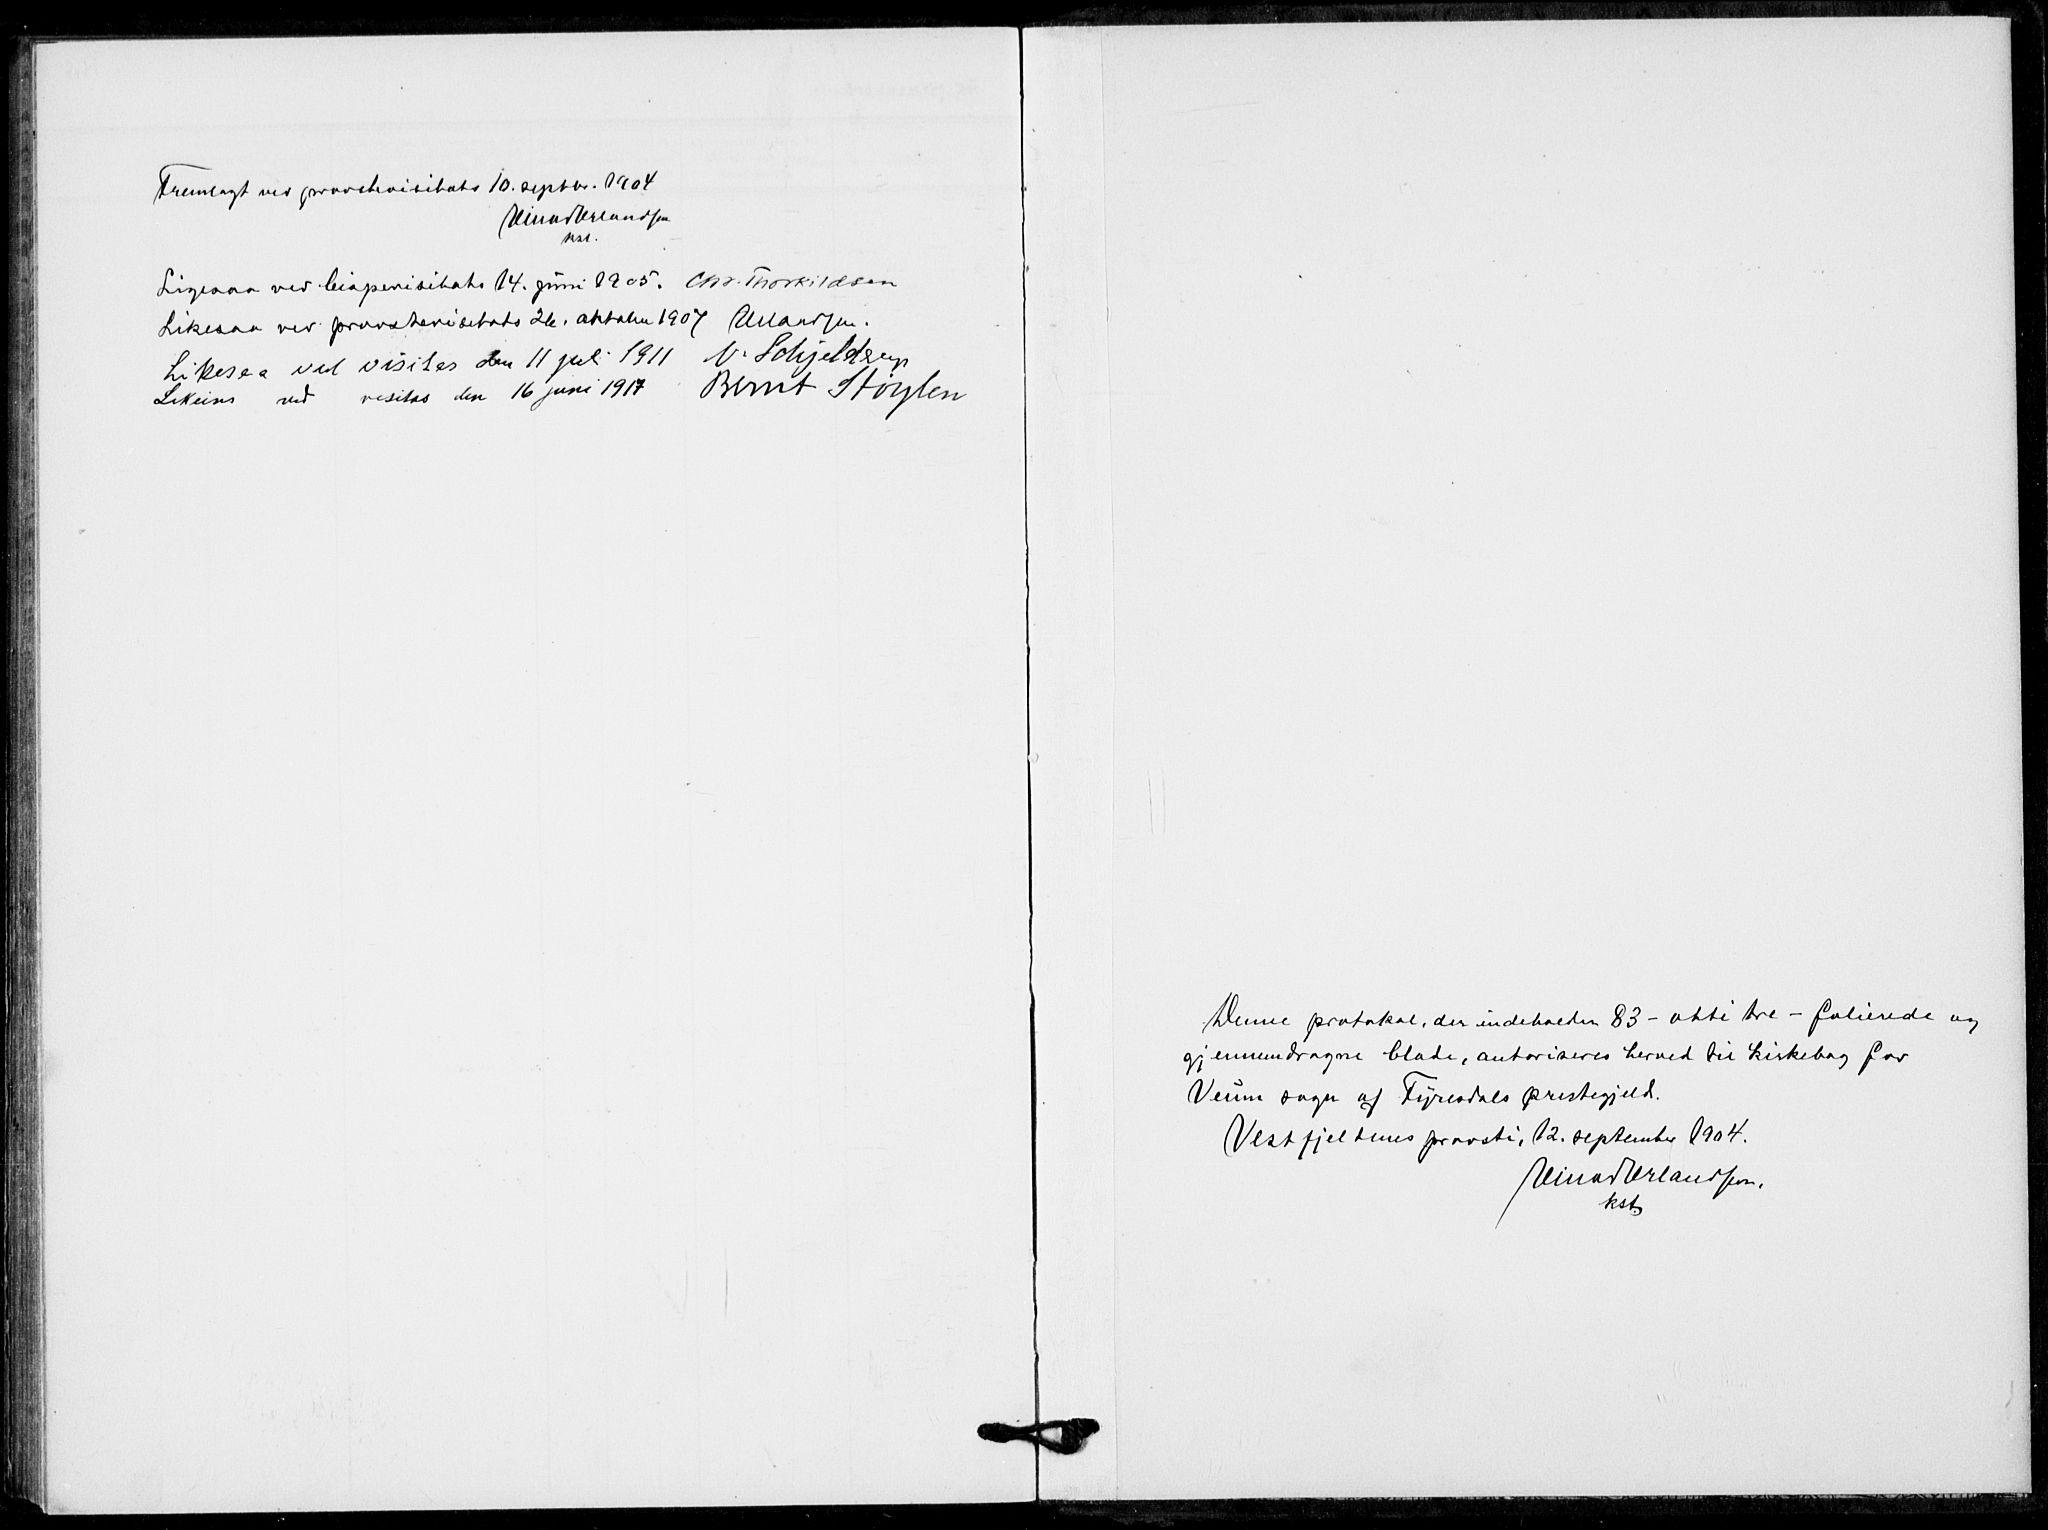 SAKO, Fyresdal kirkebøker, F/Fb/L0004: Ministerialbok nr. II 4, 1903-1920